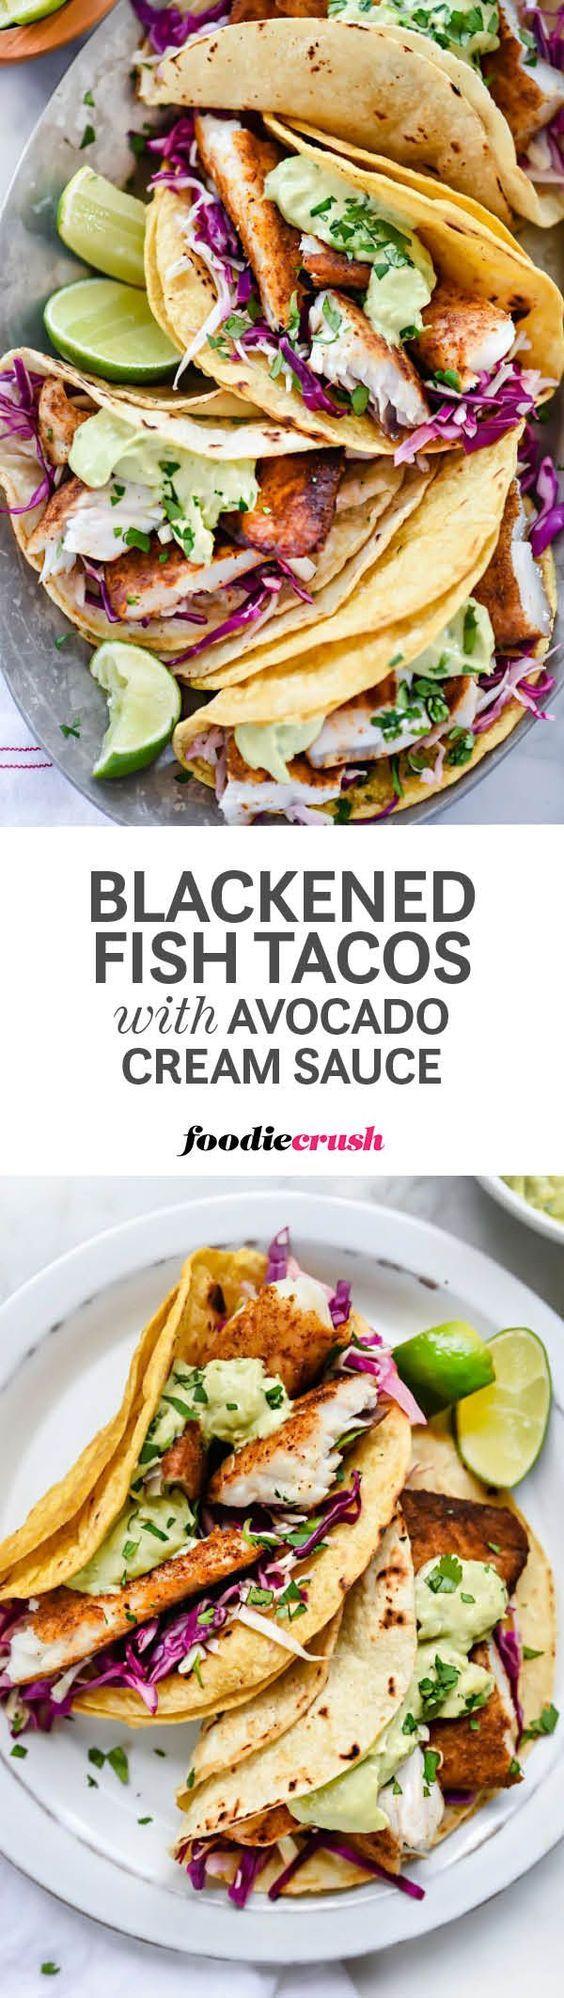 blackened fish tacos sauce - photo #24